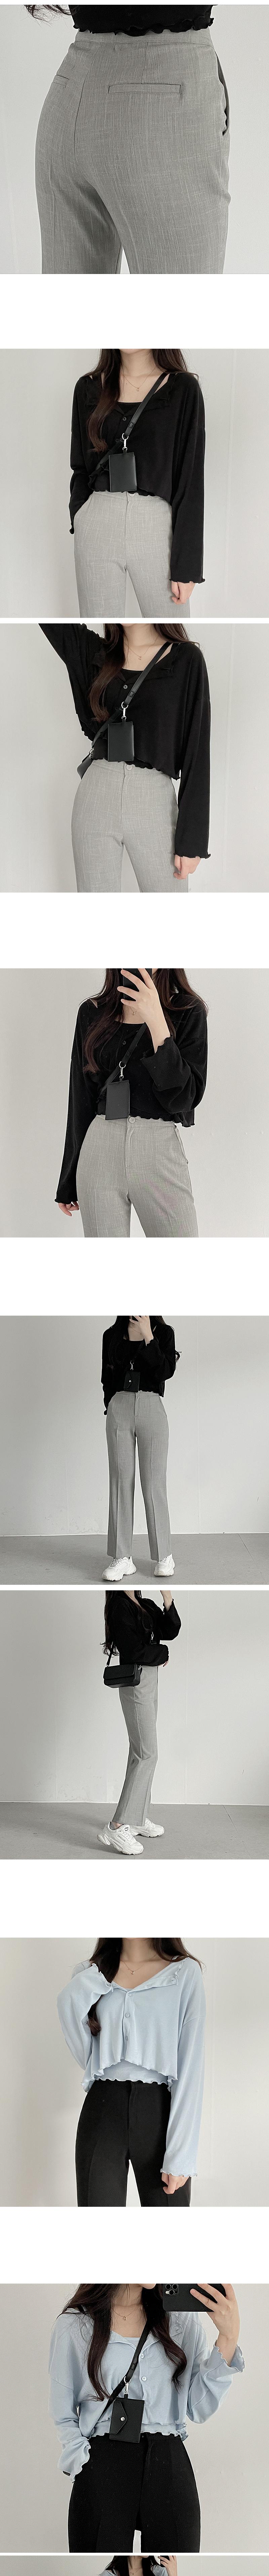 neat fit cool slacks